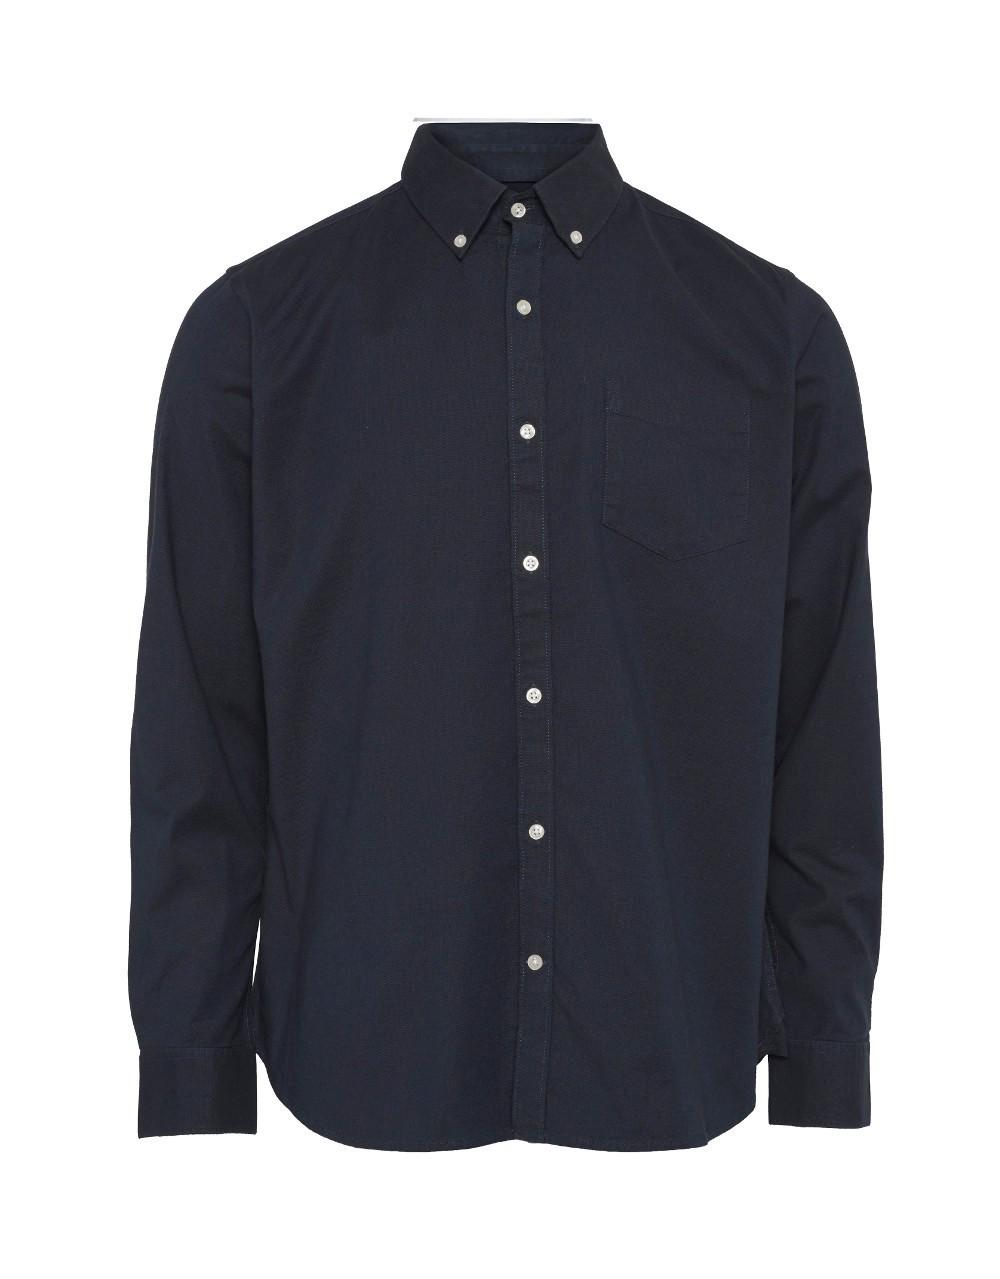 ELDER Regular fit Stretch Oxford Shirt - Vegan Total Eclipse